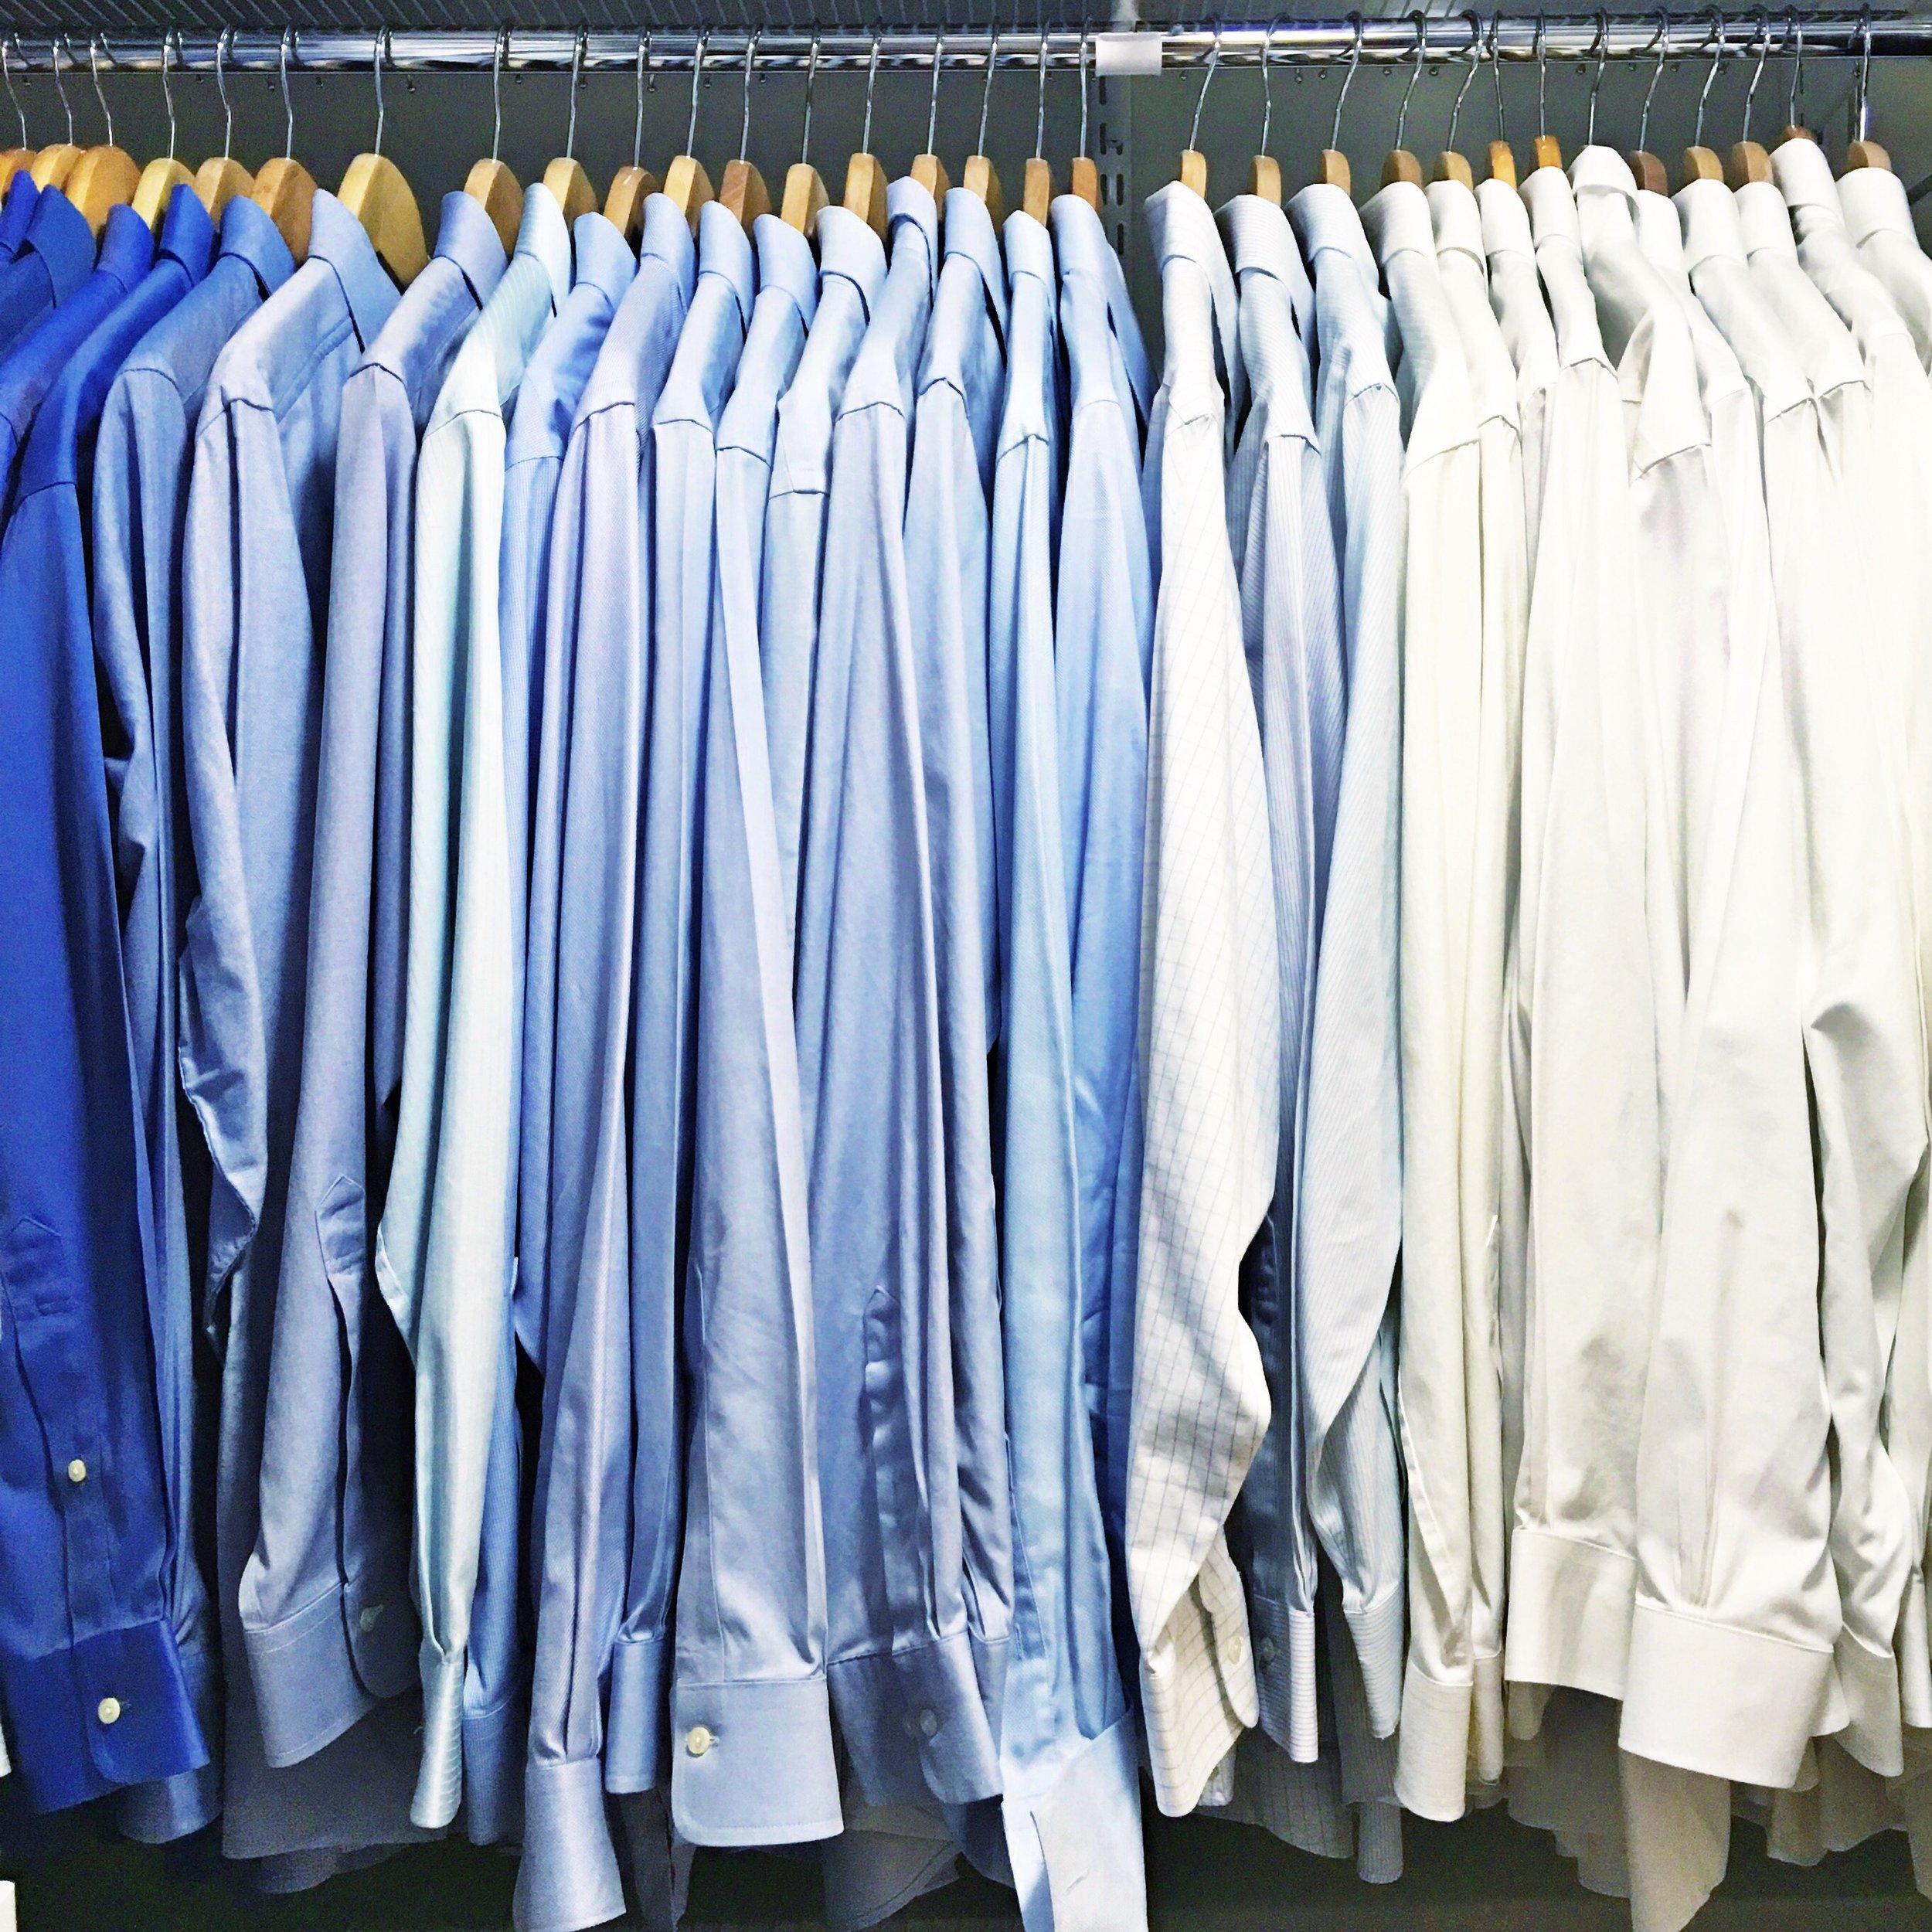 Shelfie_Organized mens shirts_Organized blue Shirts_Organized Closet